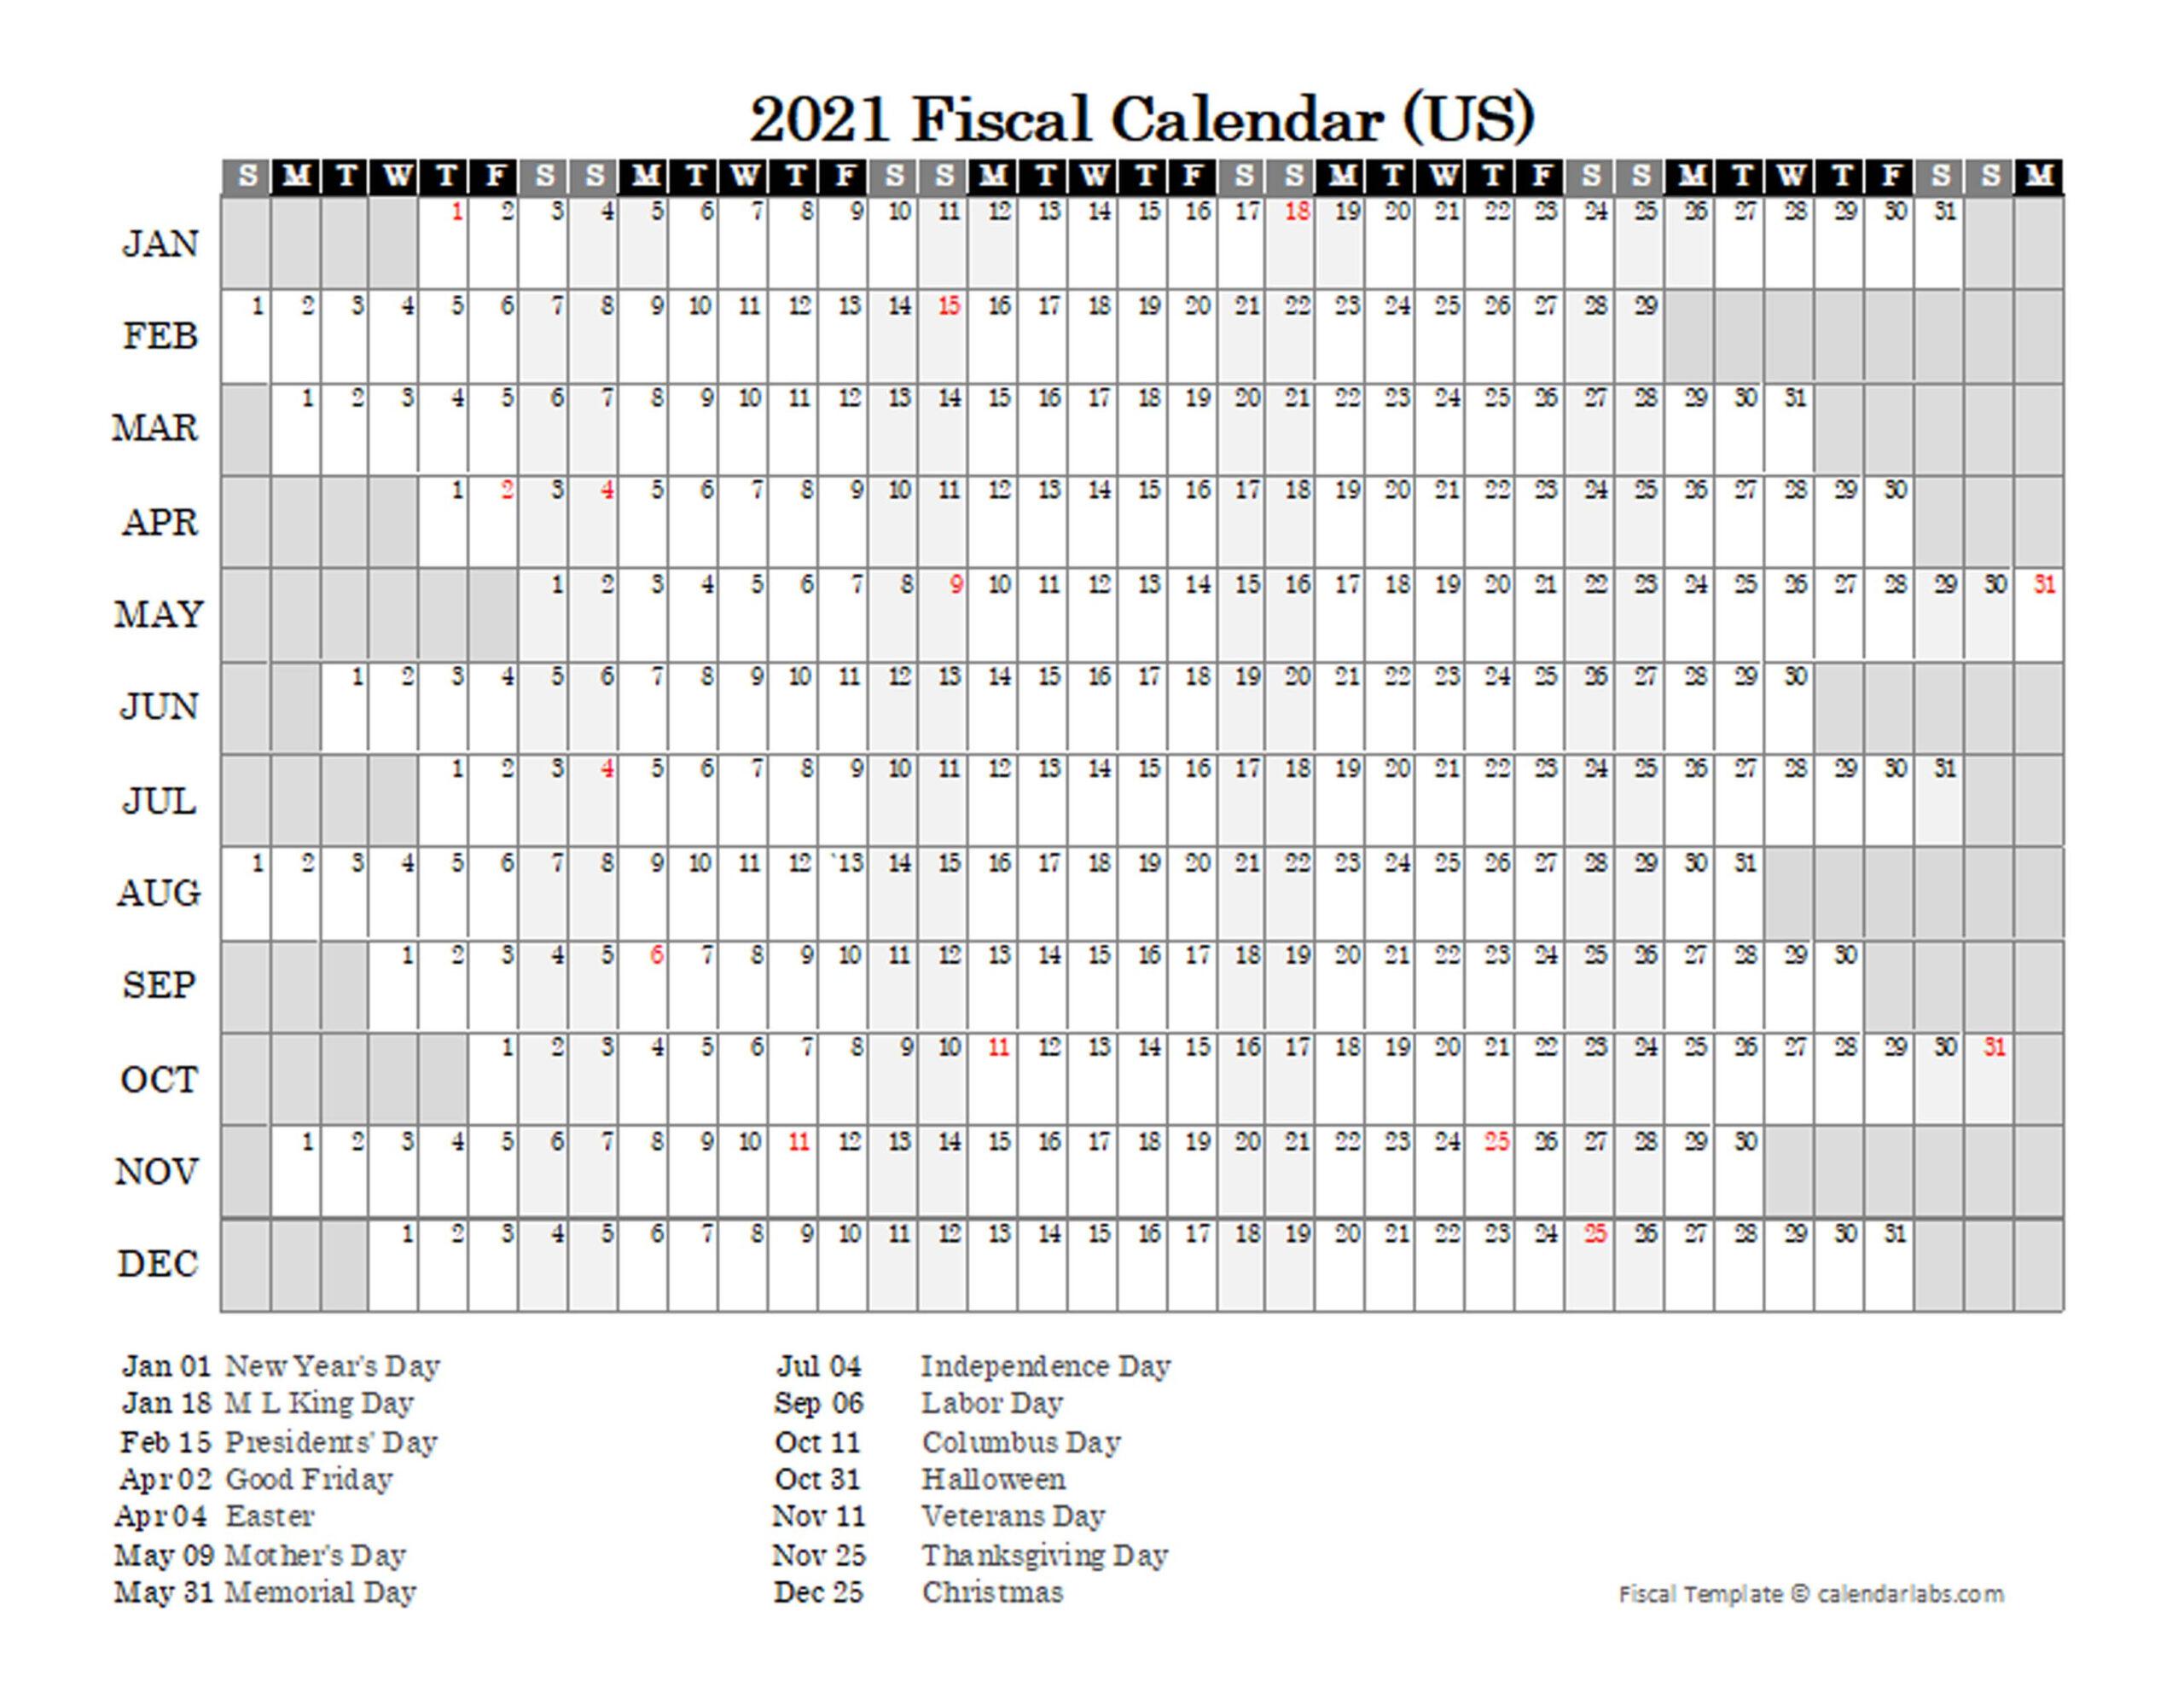 2021 Fiscal Calendar Usa - Free Printable Templates  2021 Fiscal Year Julian Calendar